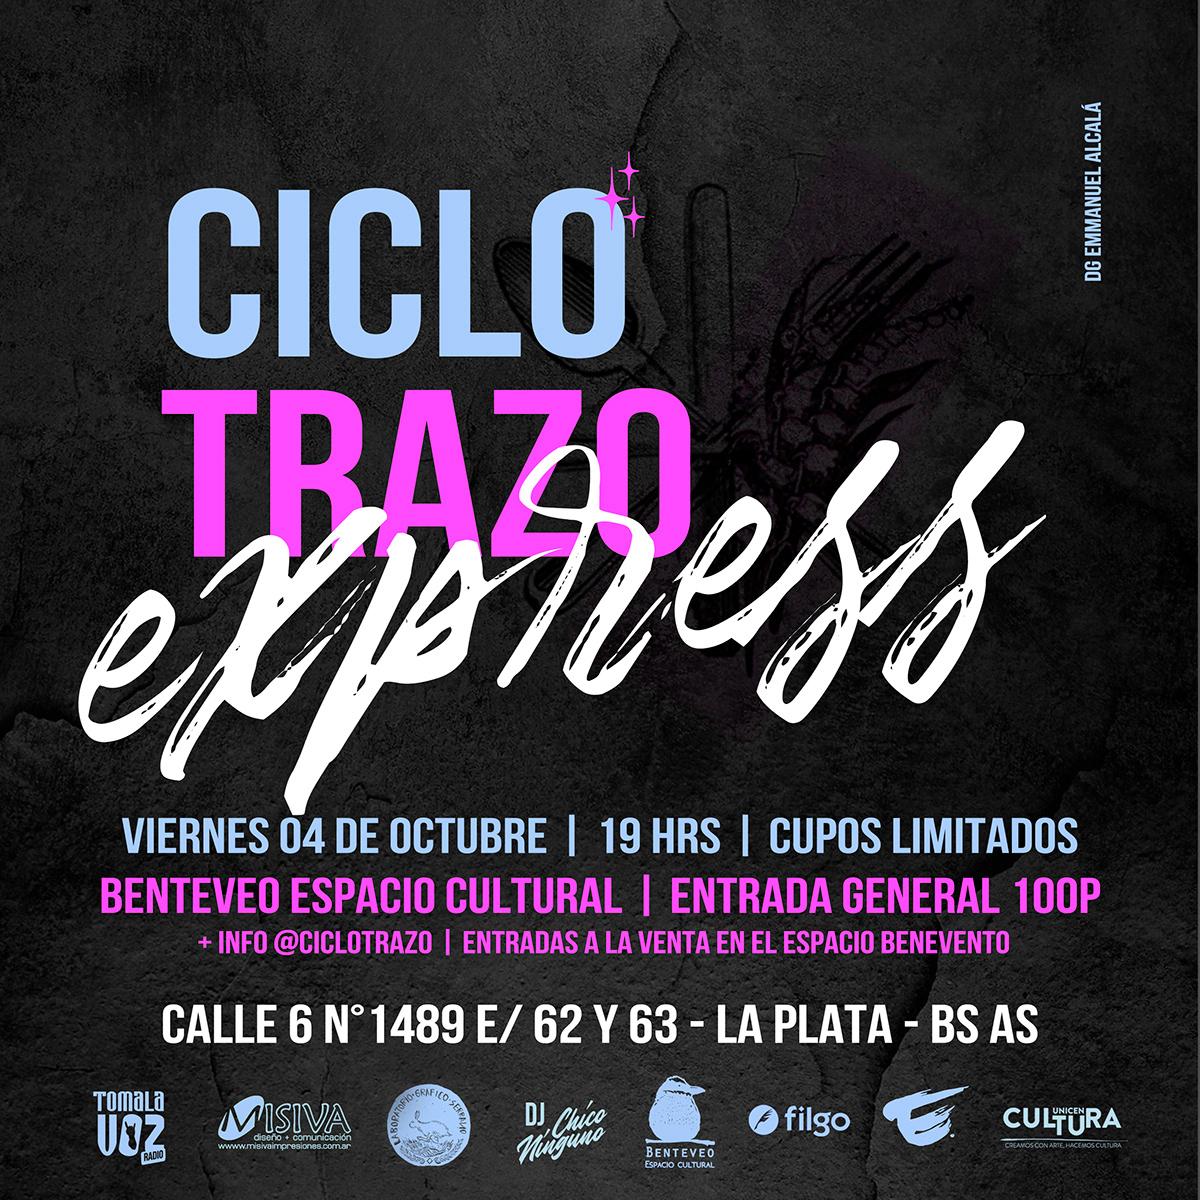 ciclotrazo arte experiencia modelovivo modellife brand branding  Experience